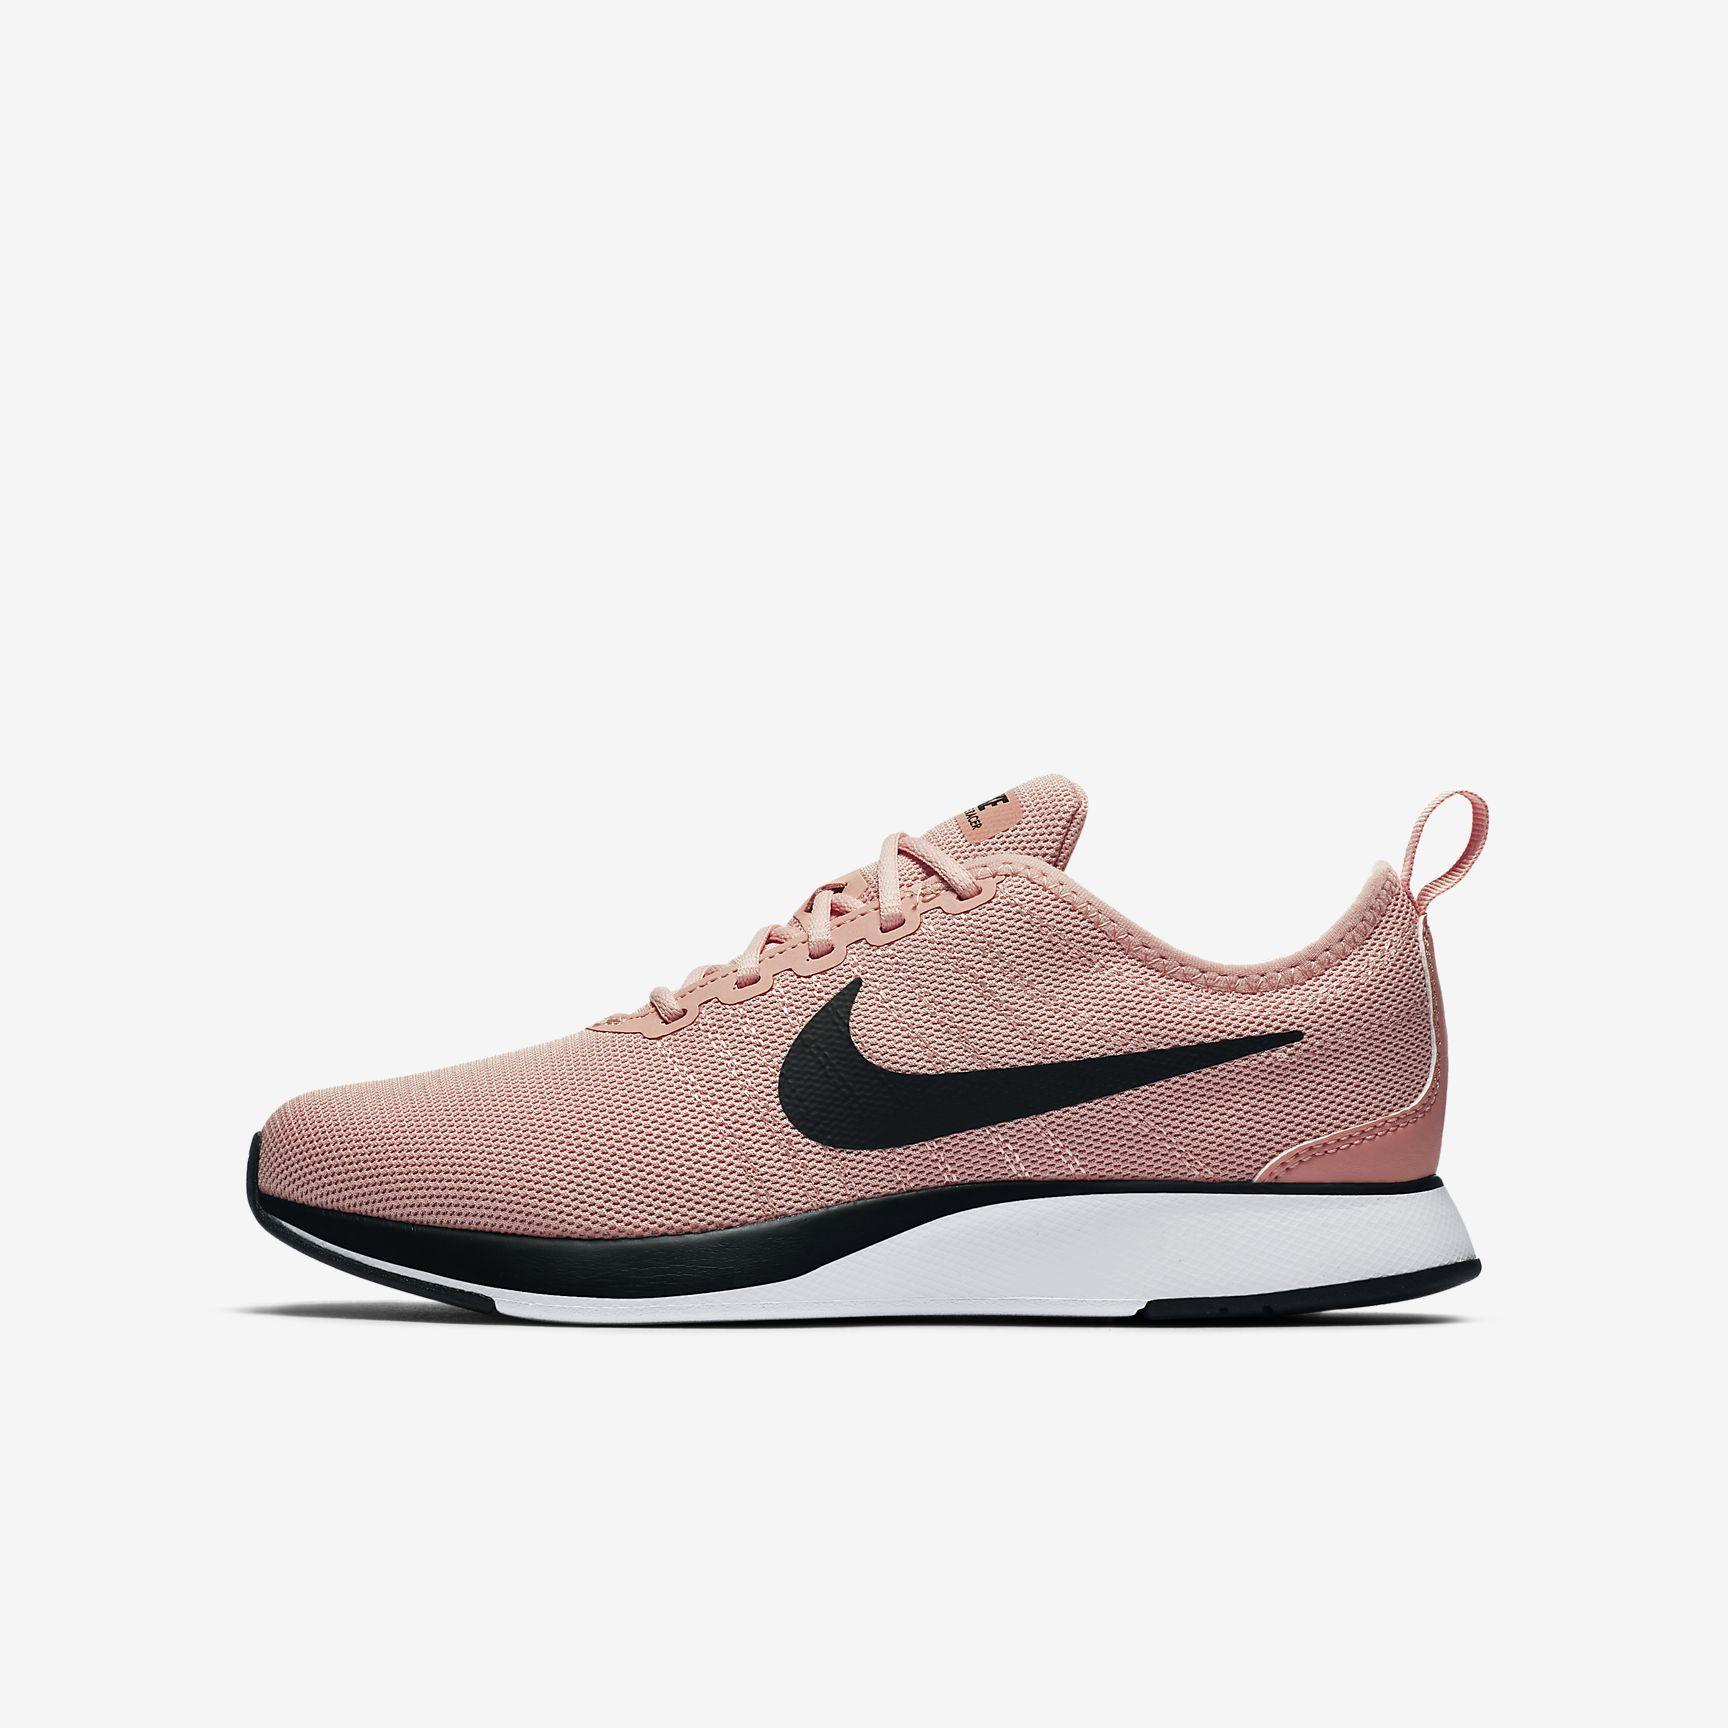 1f8499a34063 Nike Dualtone Racer Big Kids  Shoe